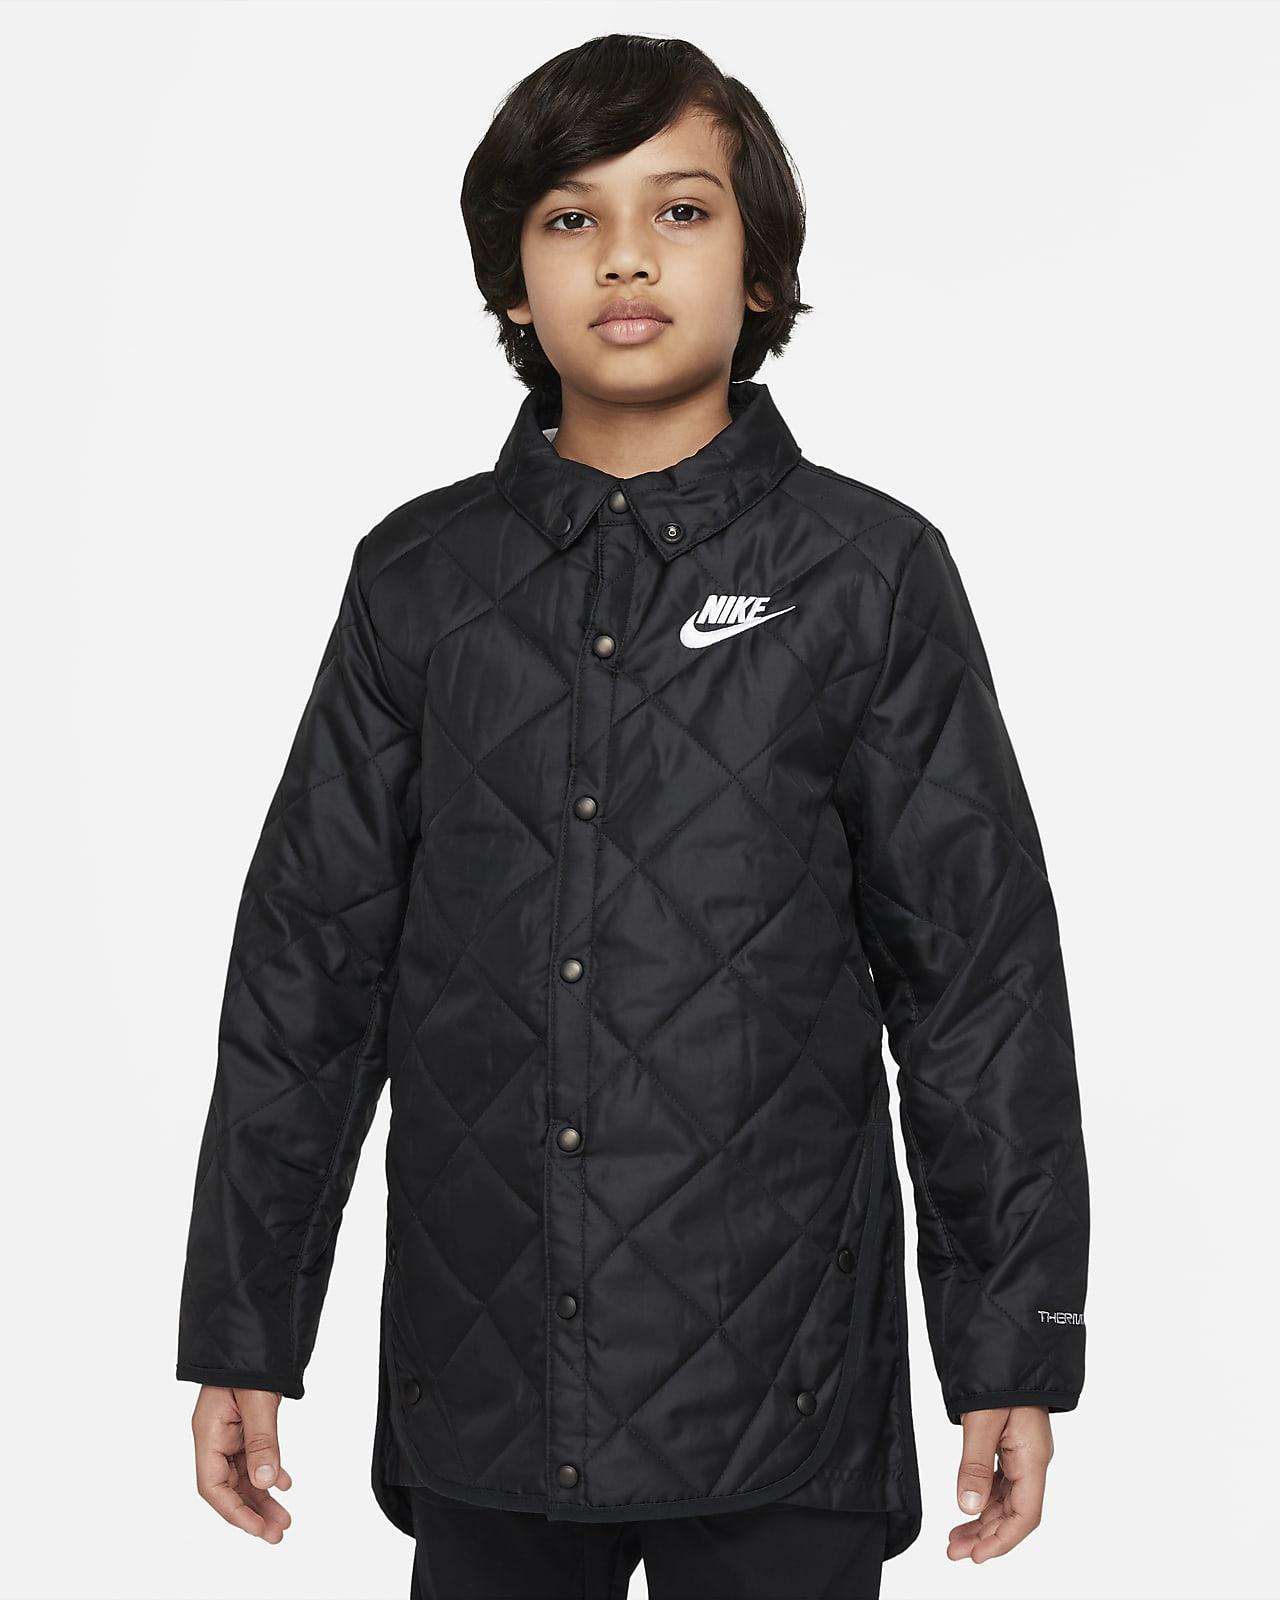 Casaco com enchimento sintético Nike Sportswear Júnior